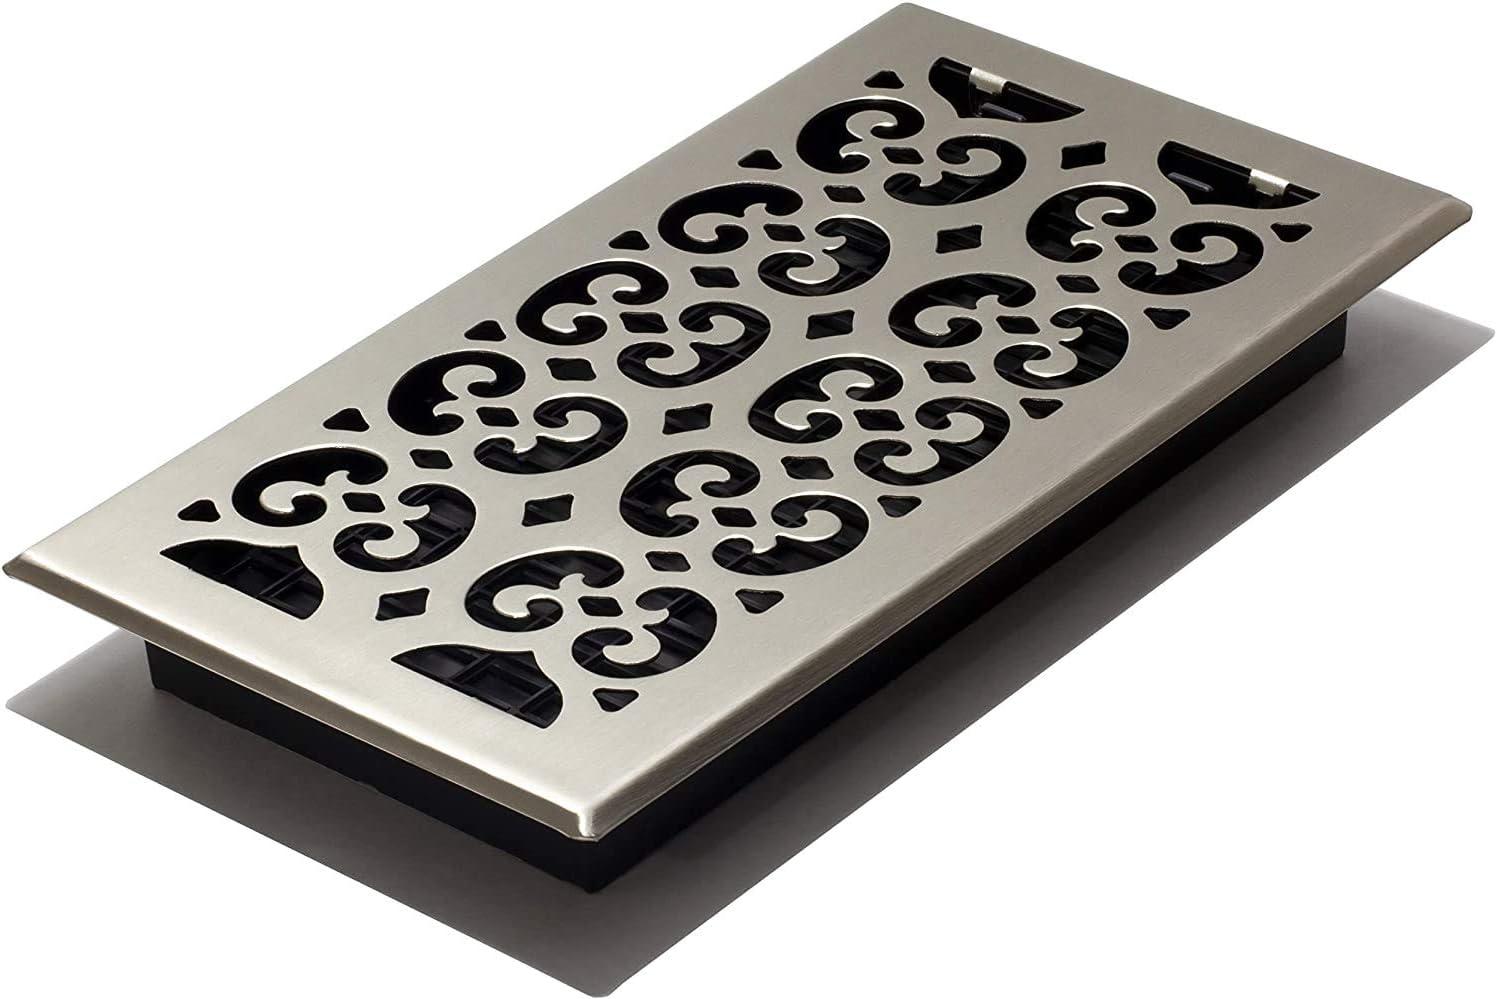 Decor Grates SPH612-NKL Floor Register, 6x12, Nickel Finish